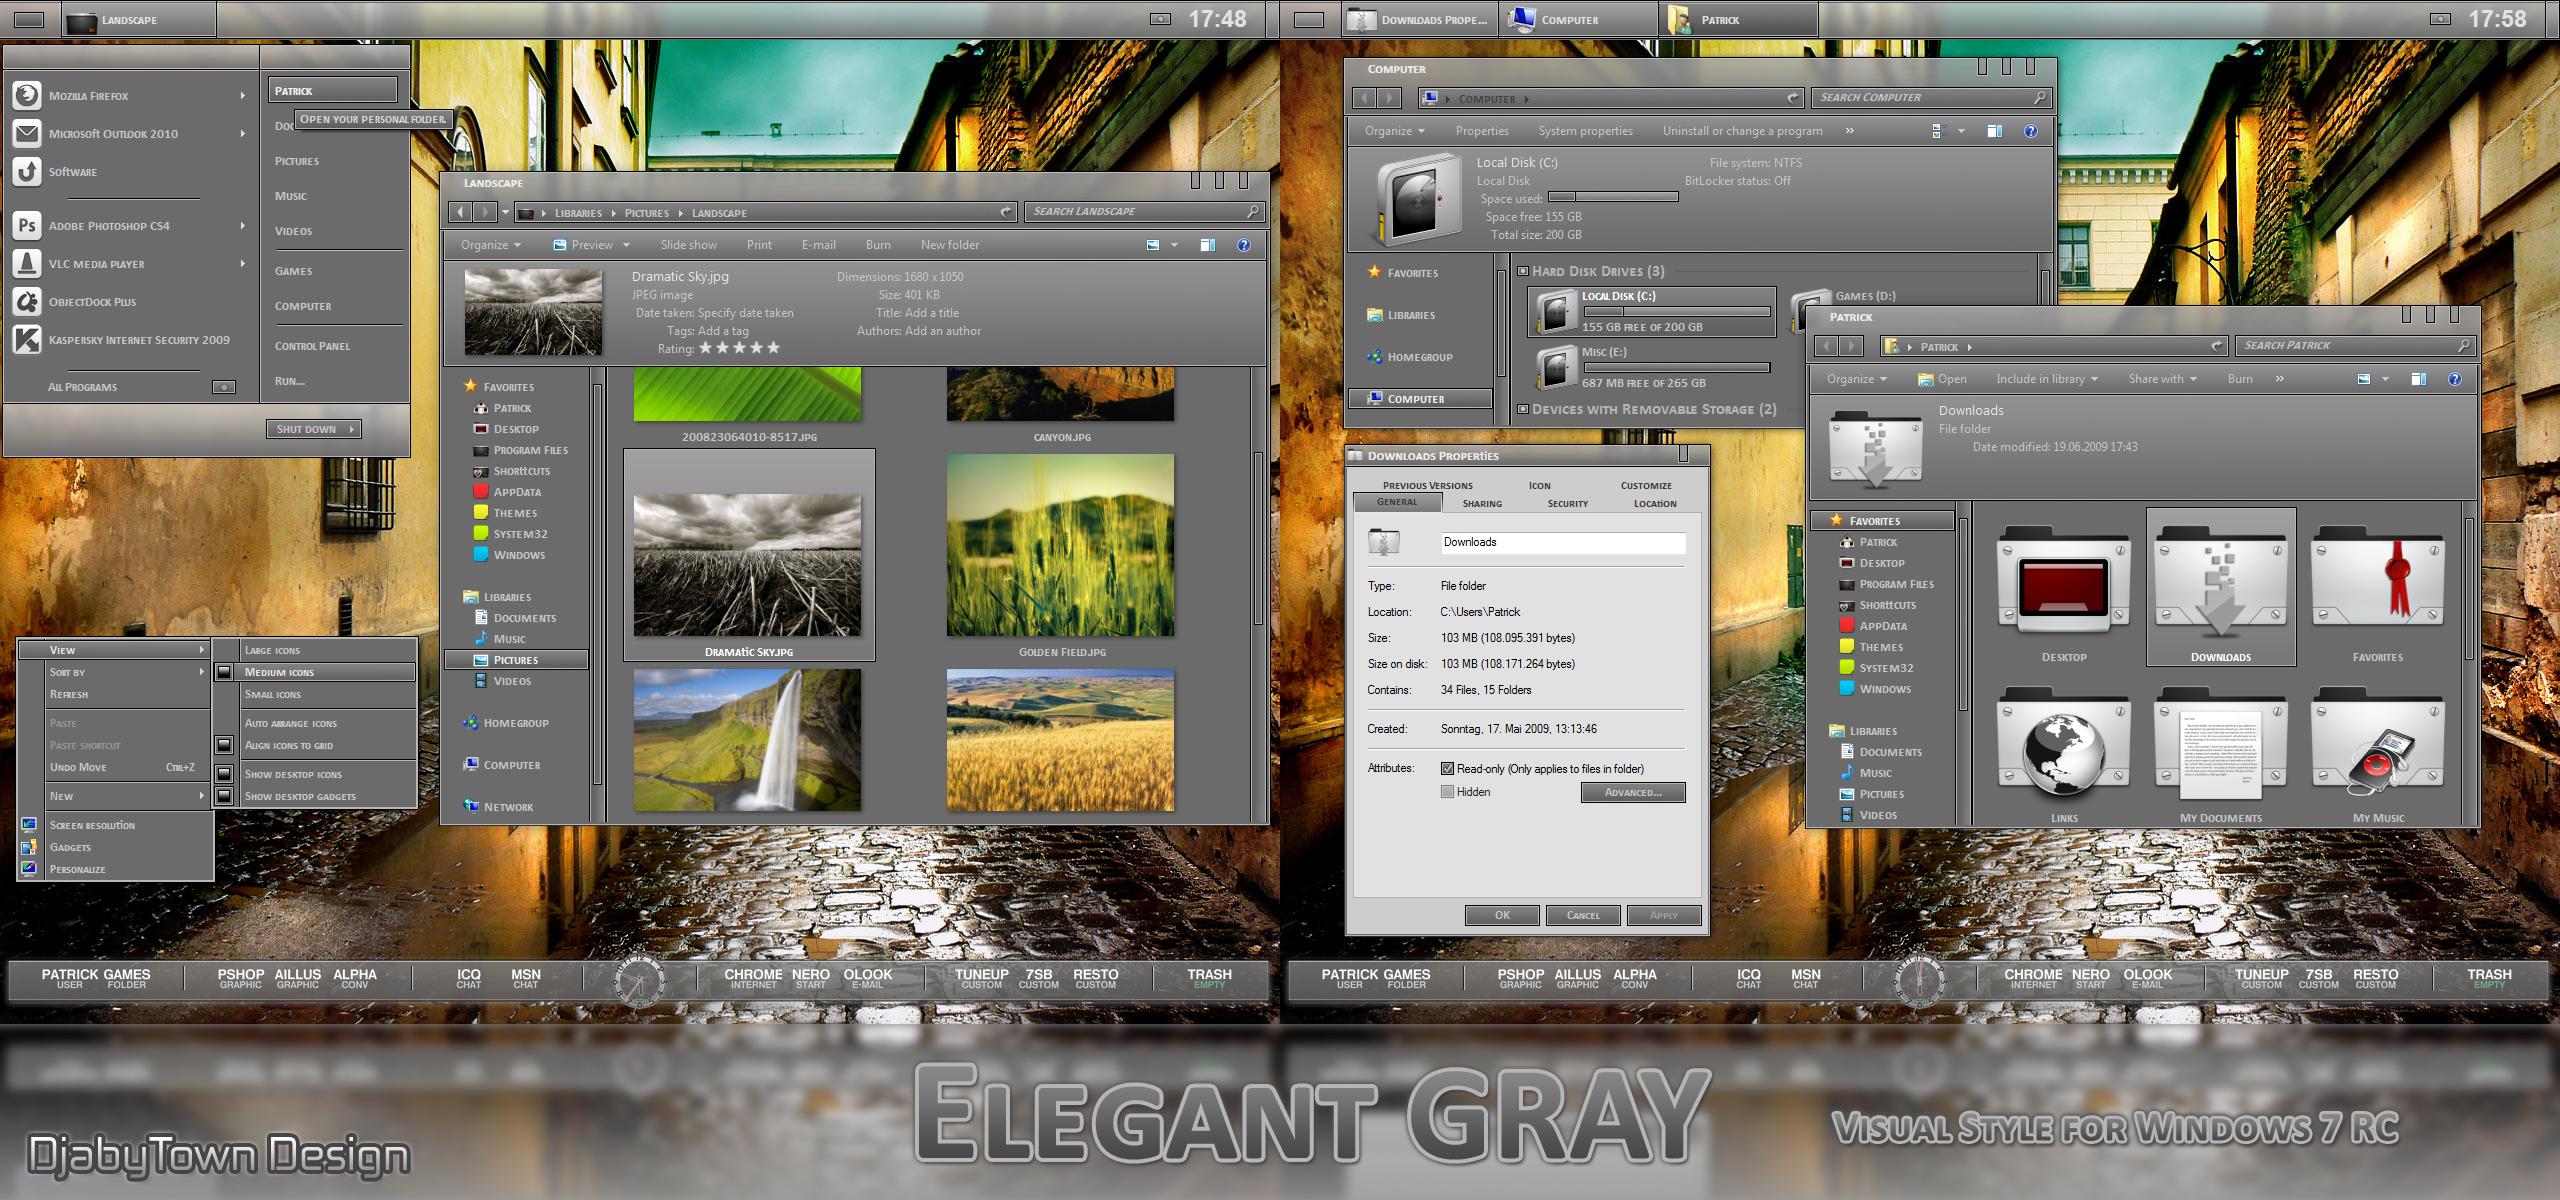 Elegant GRAY VS - Windows 7 RC